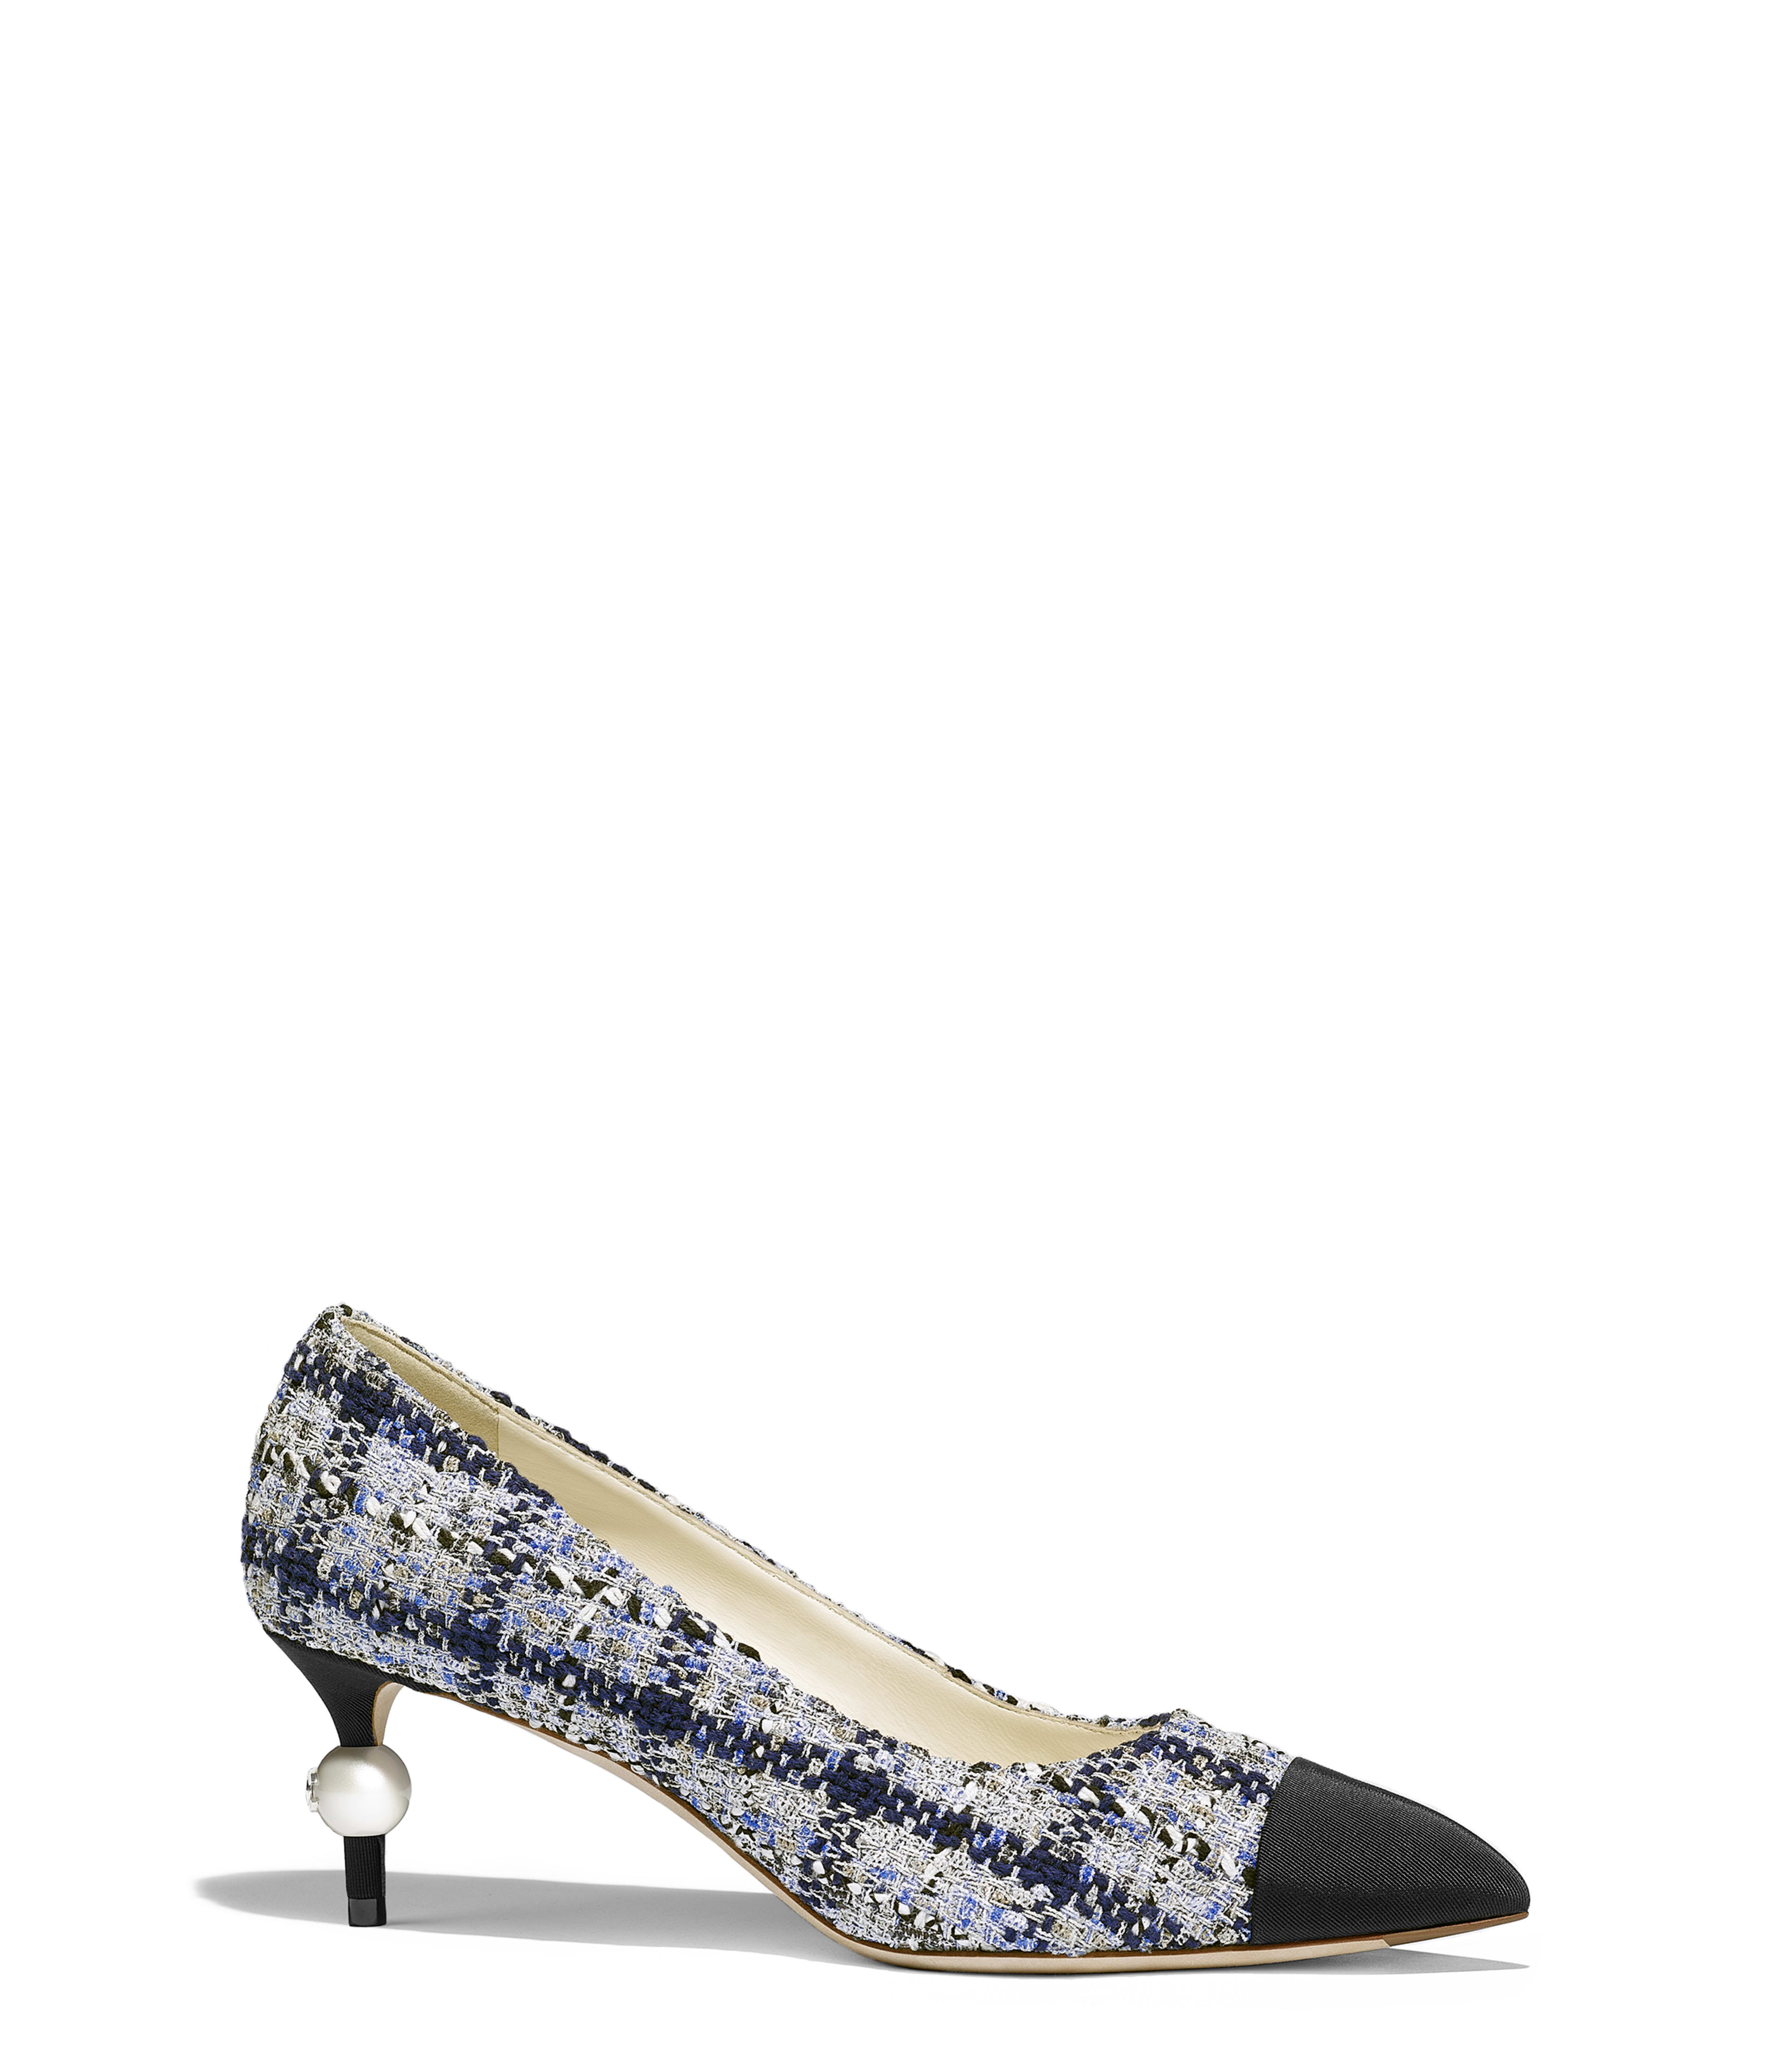 97357eb43a8 Chanel Shoes Pumps - Style Guru  Fashion